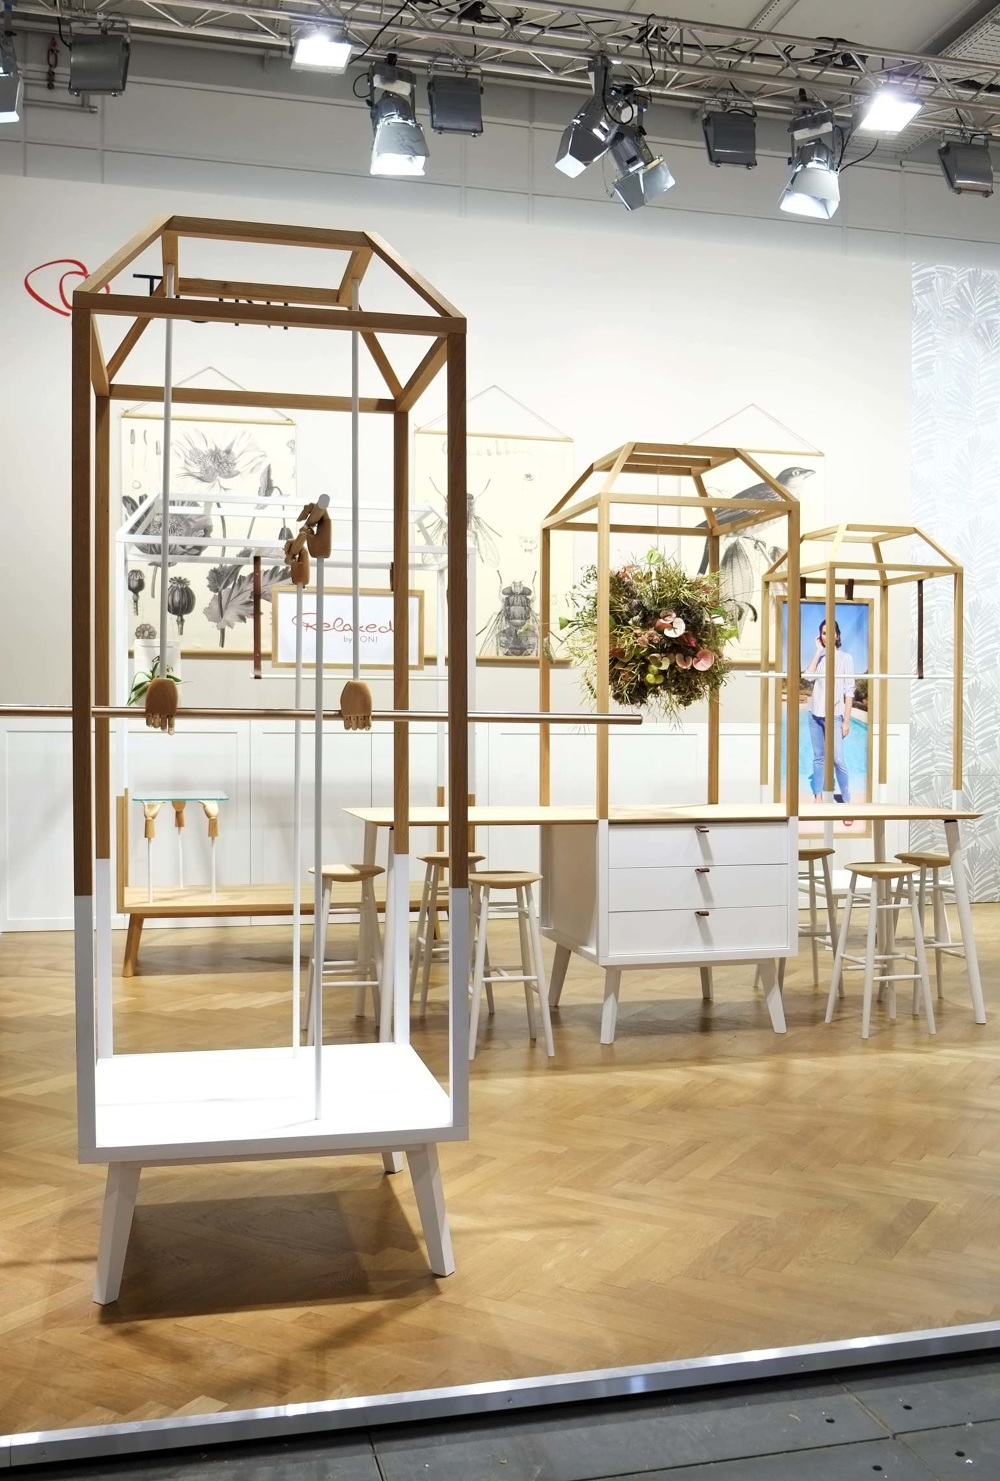 Exhibition Stand Architecture : Toni exhibition stand panorama berlin jonas görtz interior